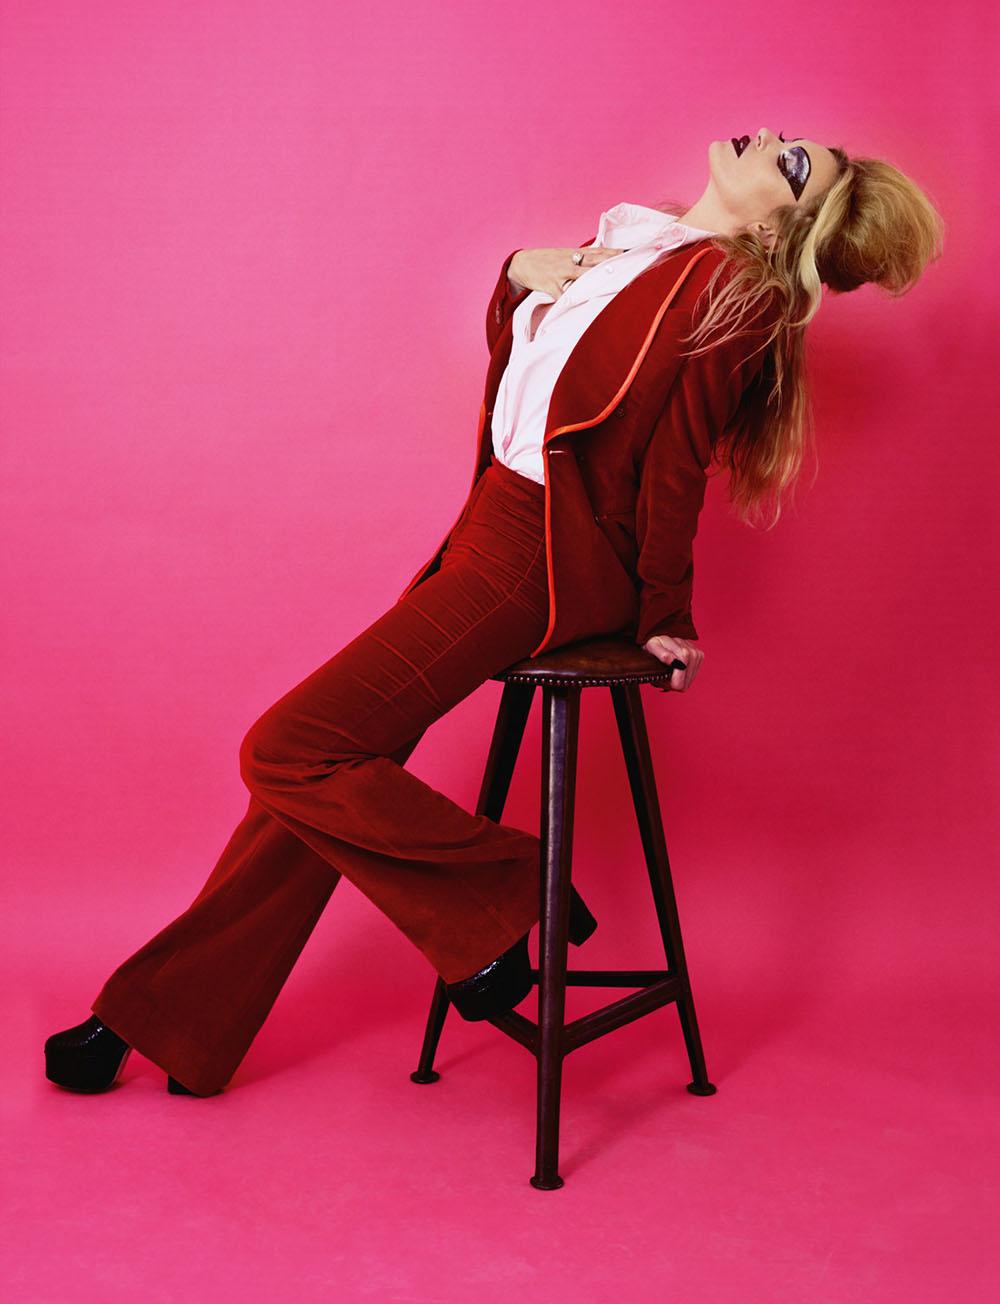 Kate Moss covers Love Magazine 20.5 by Steve Mackey & Douglas Hart